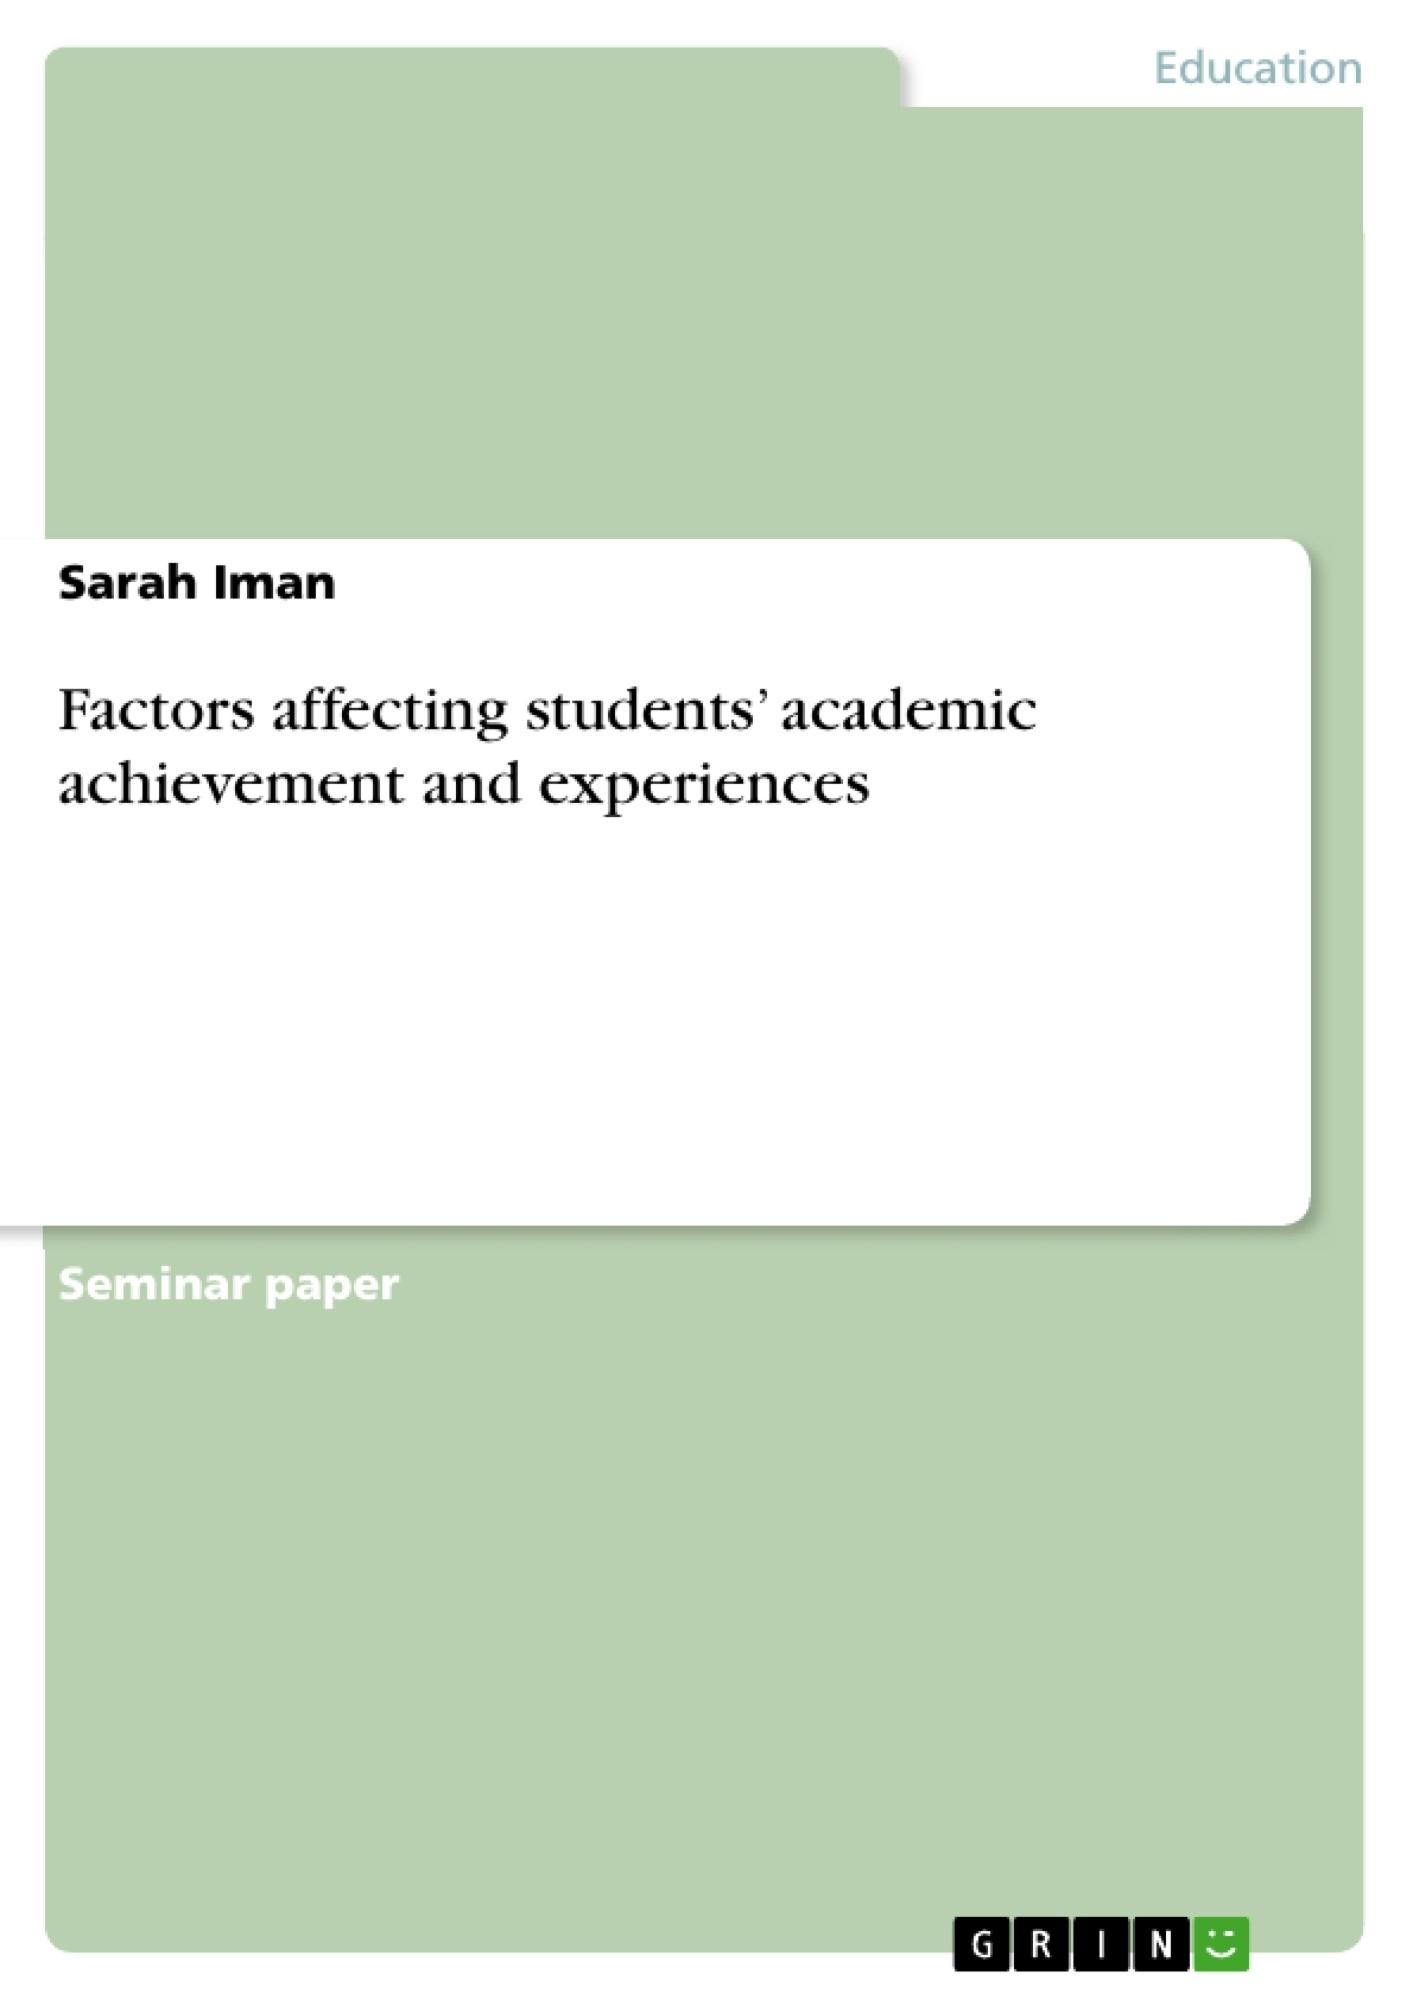 Title: Factors affecting students' academic achievement and experiences